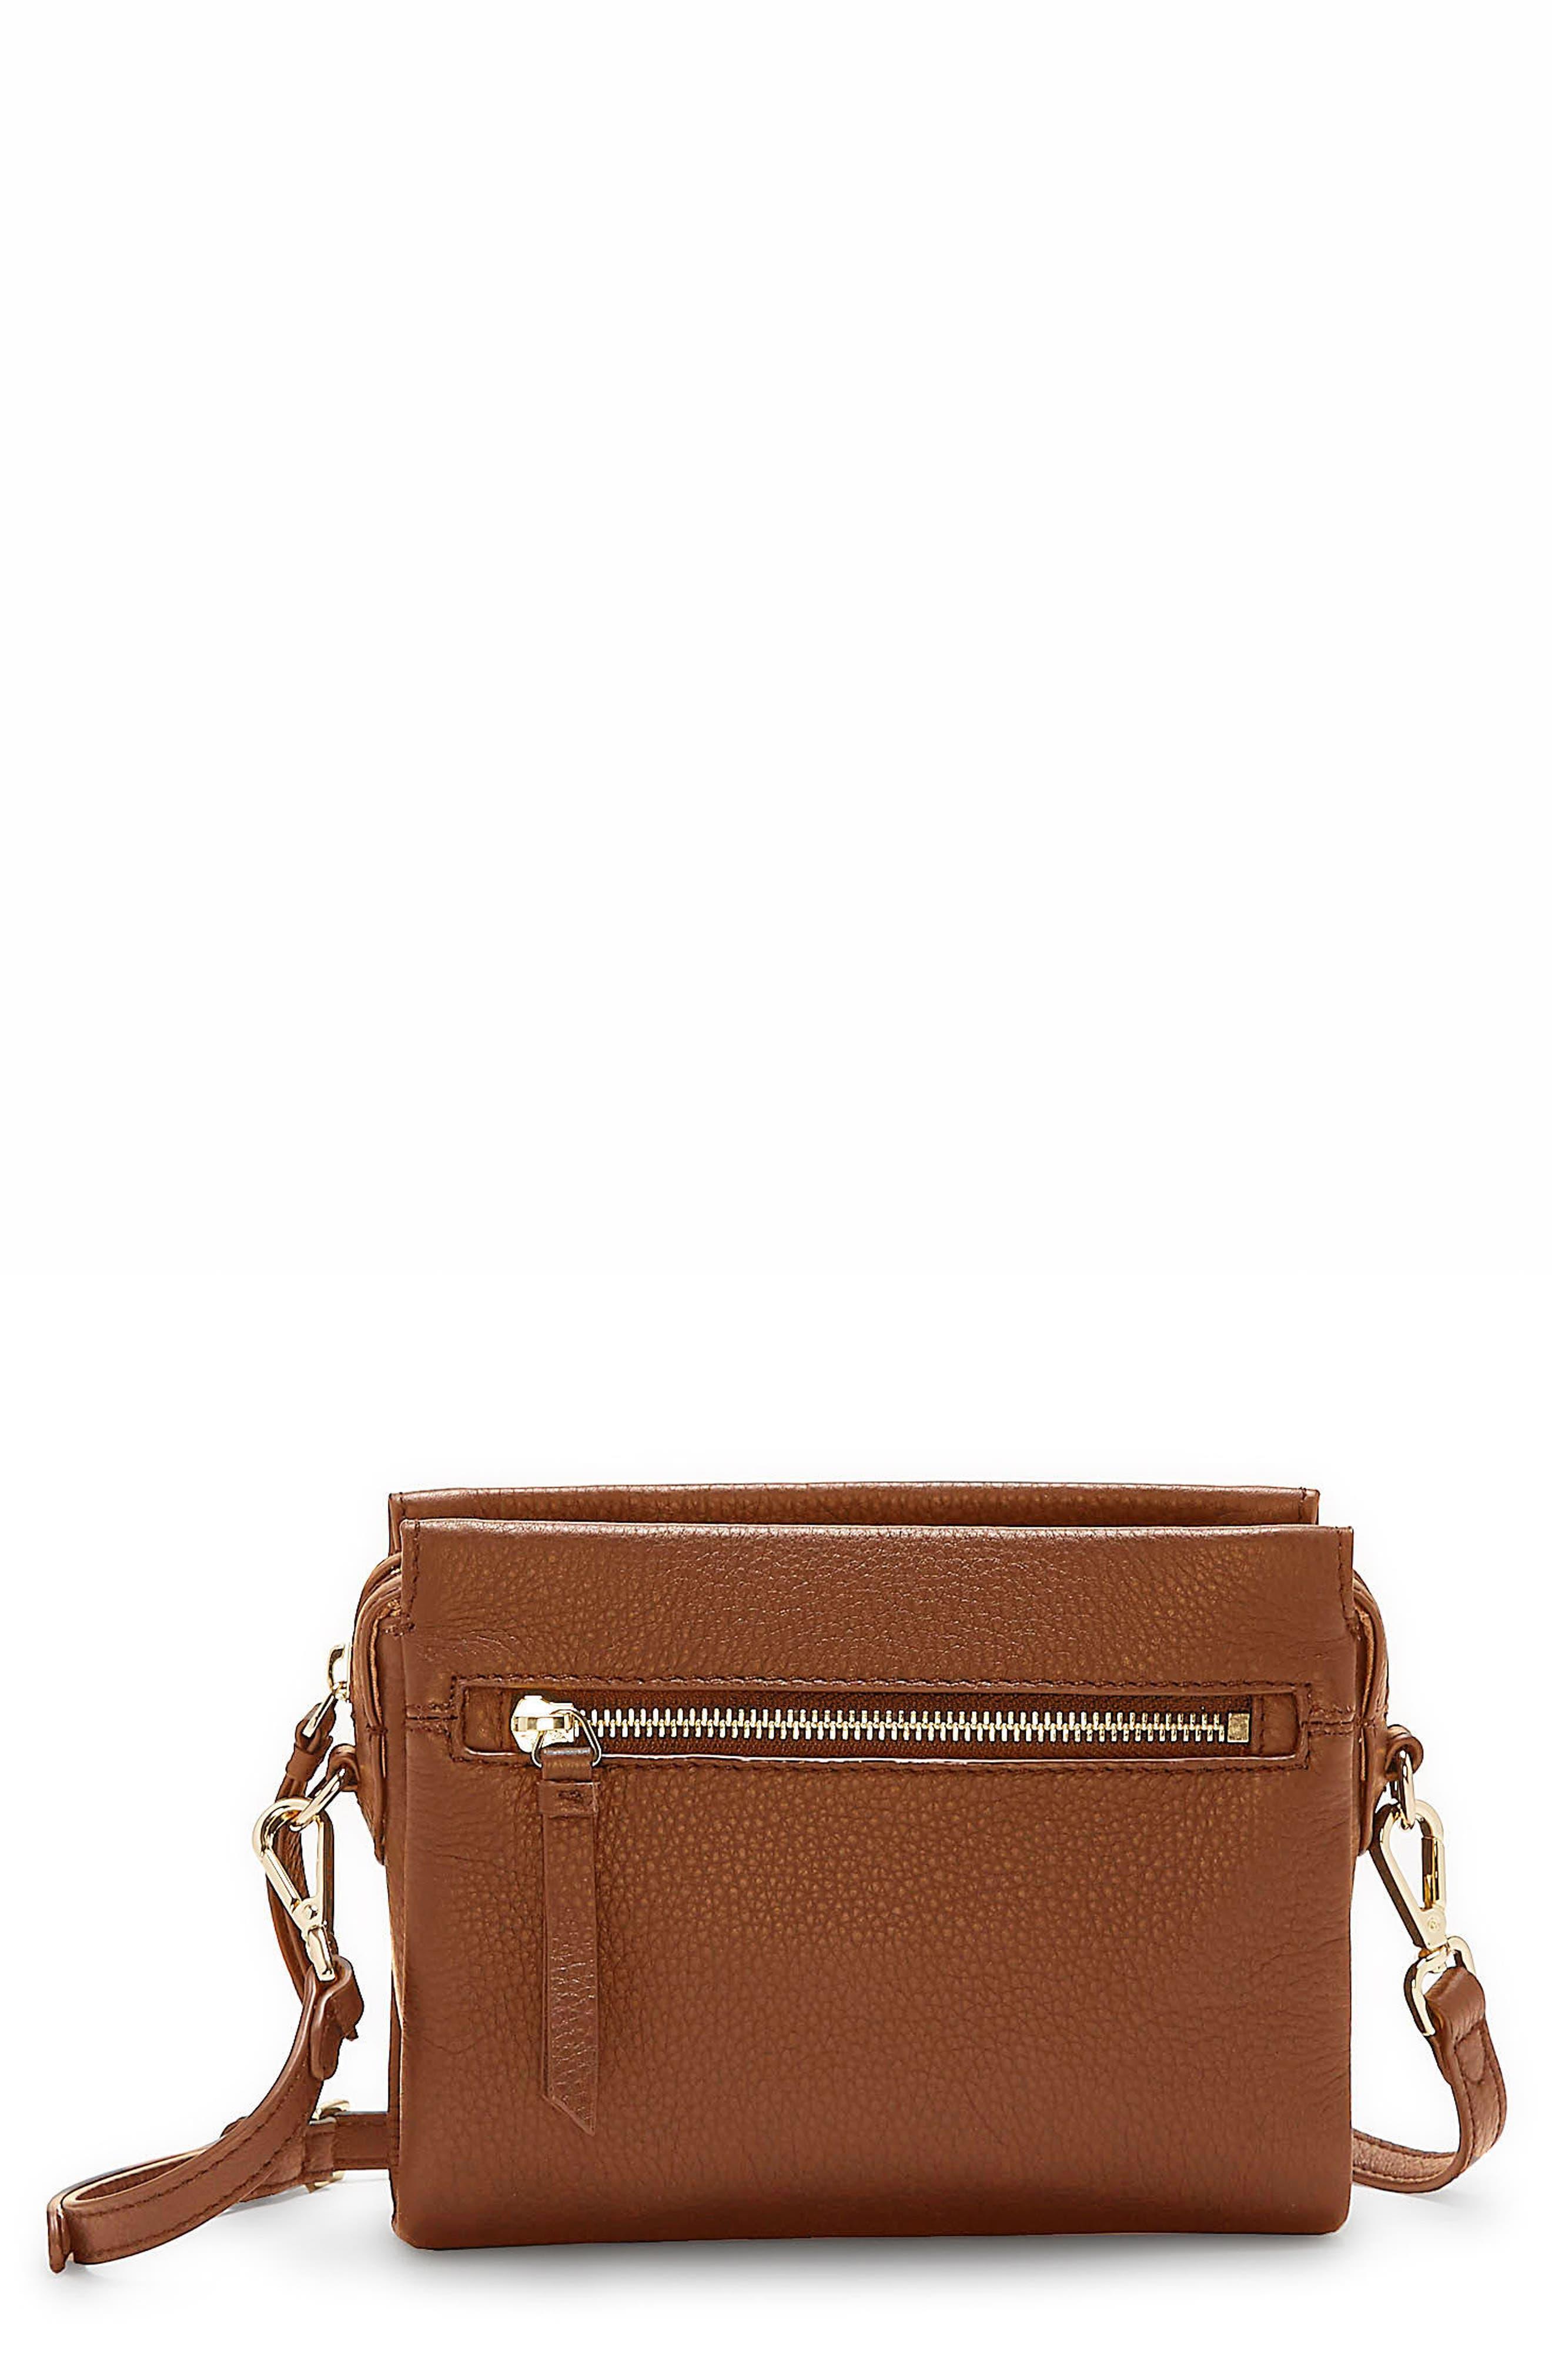 Codec Leather Crossbody Bag,                         Main,                         color, Dark Rum